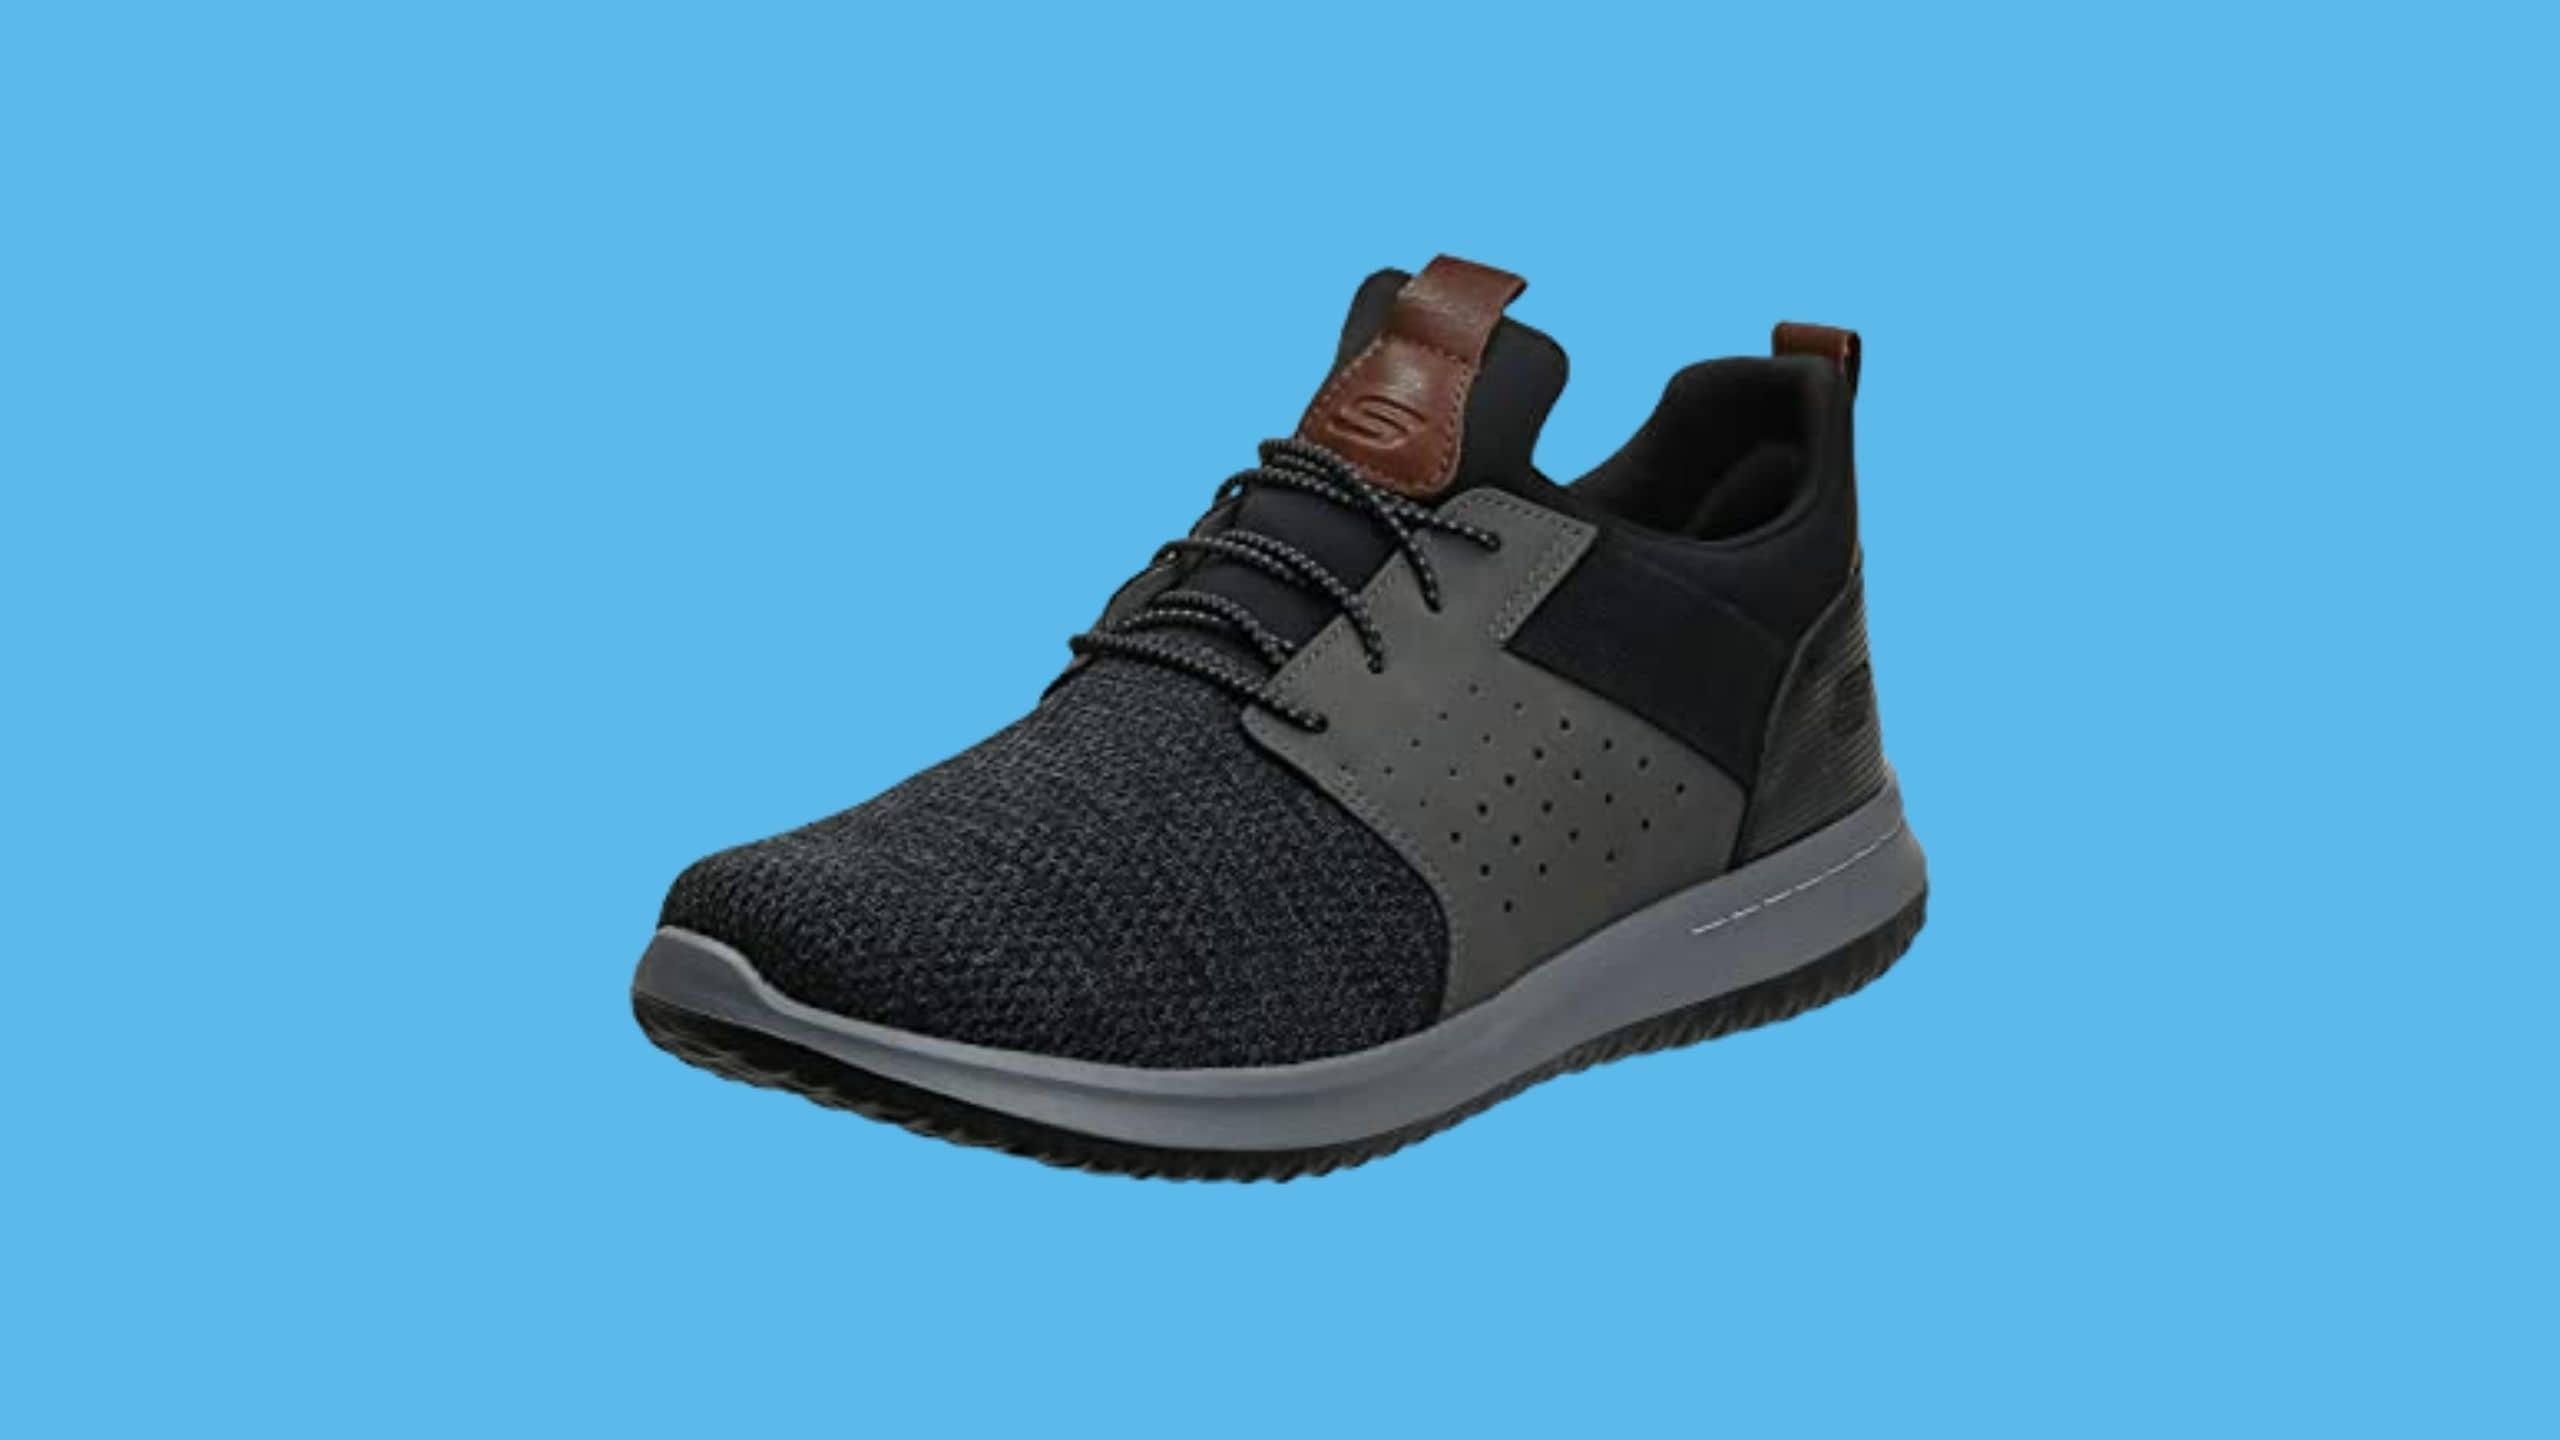 Skechers Men's Classic-Fit Sneaker